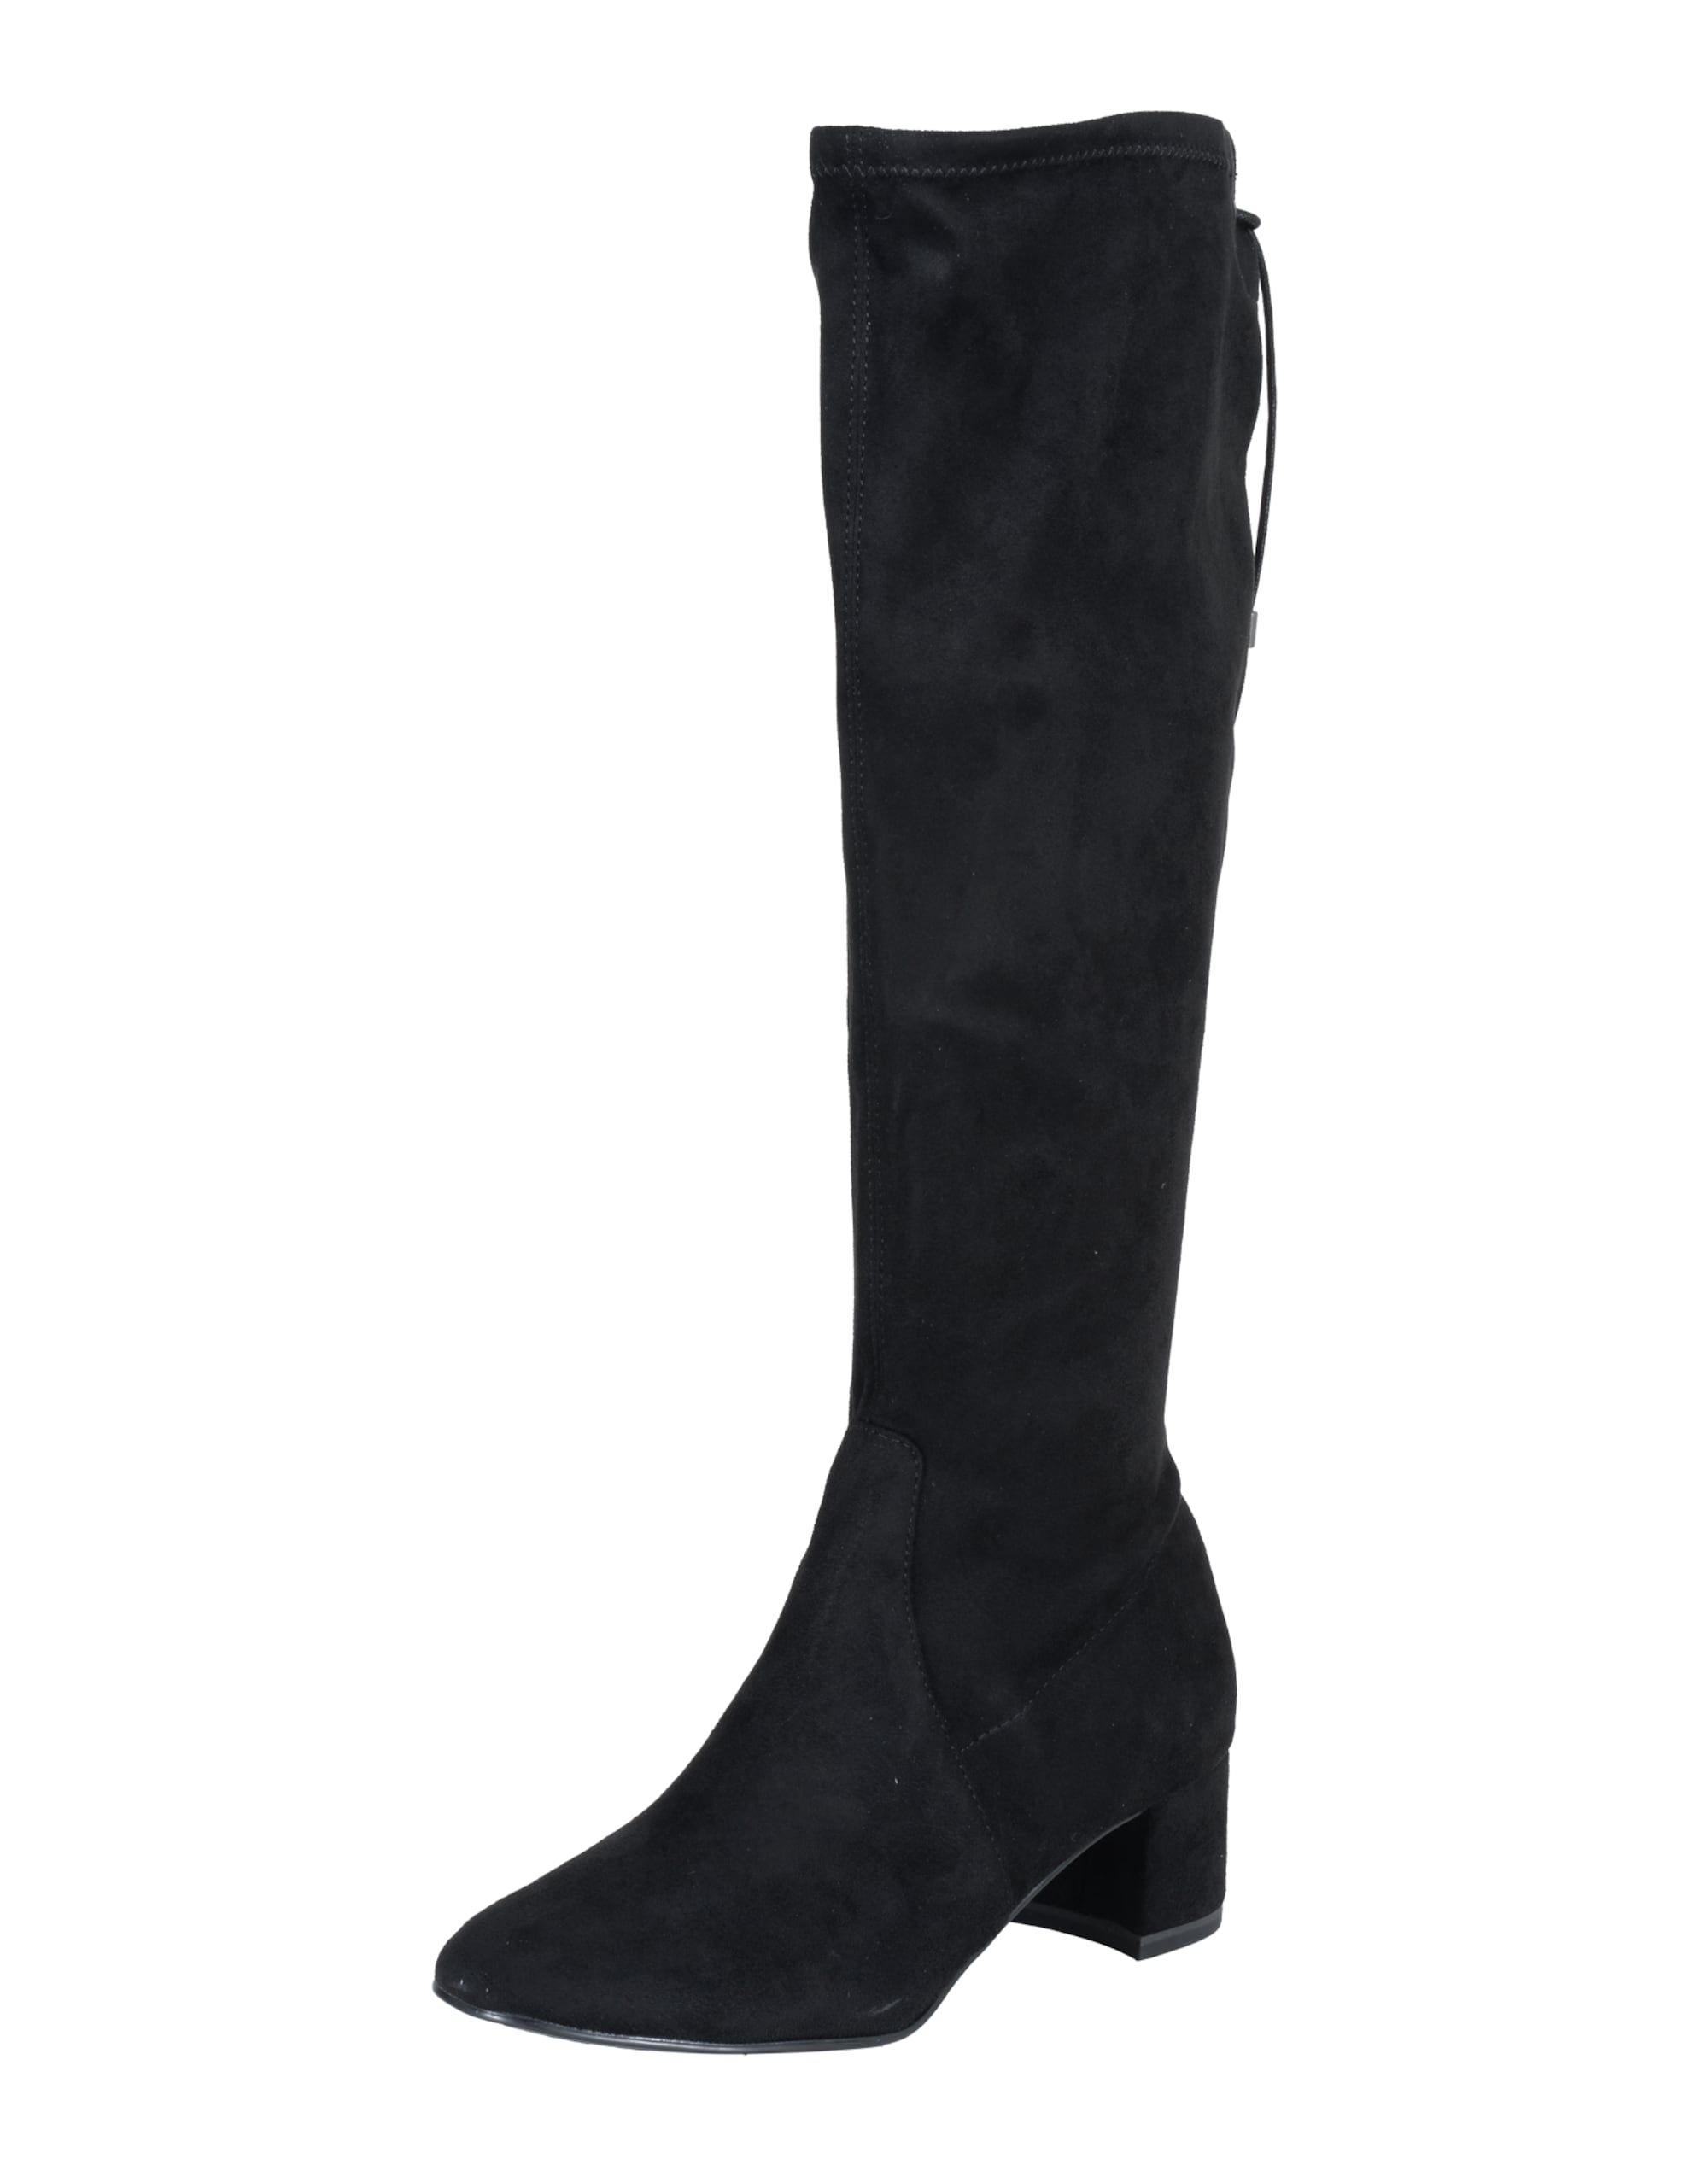 Stiefel aus stretchigem Textil